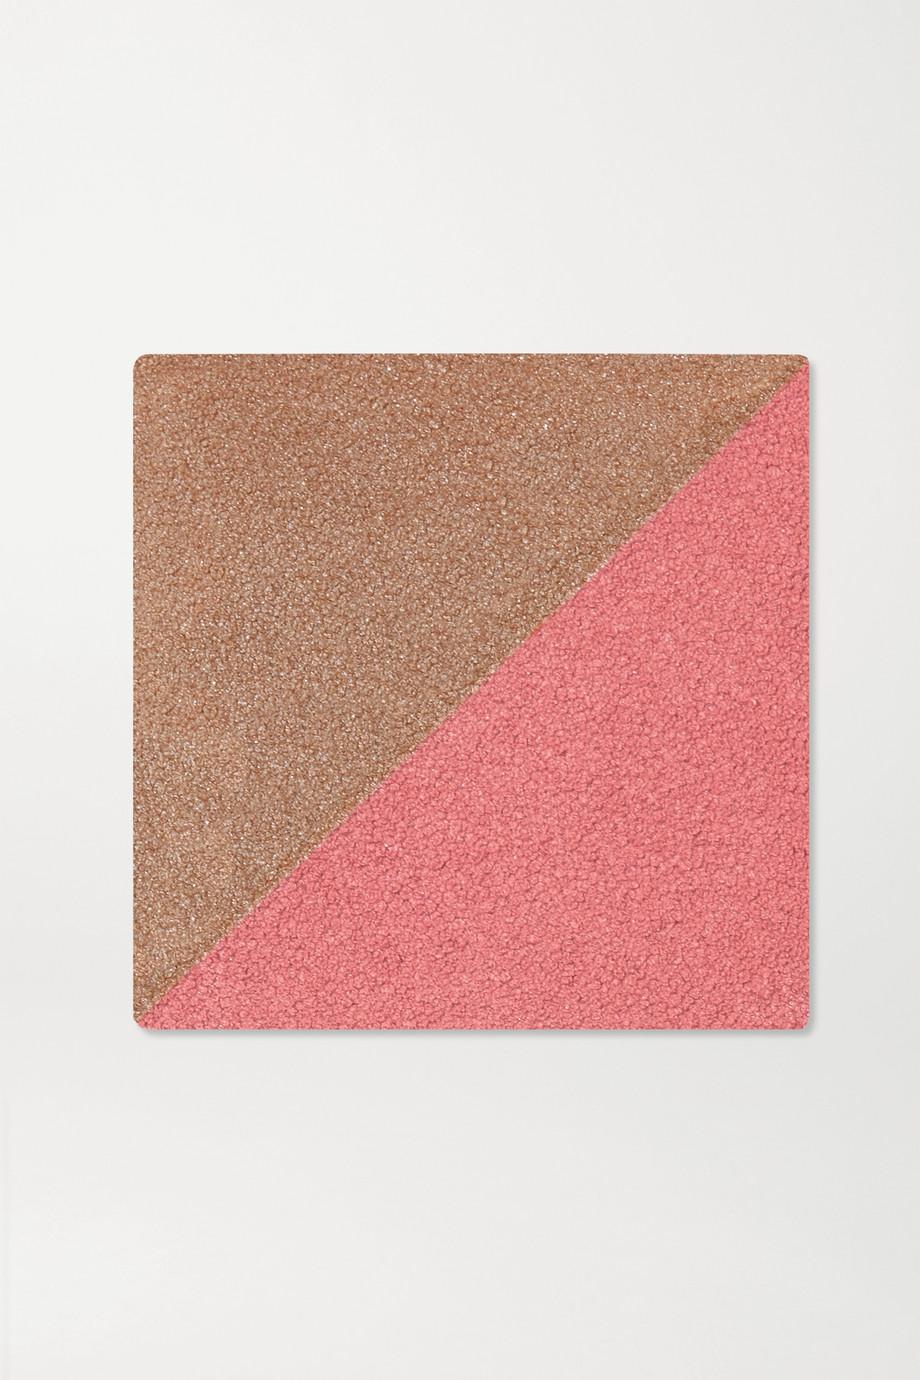 Kjaer Weis Flush and Glow Duo – Sunlit Glow – Set aus Rouge und Highlighter